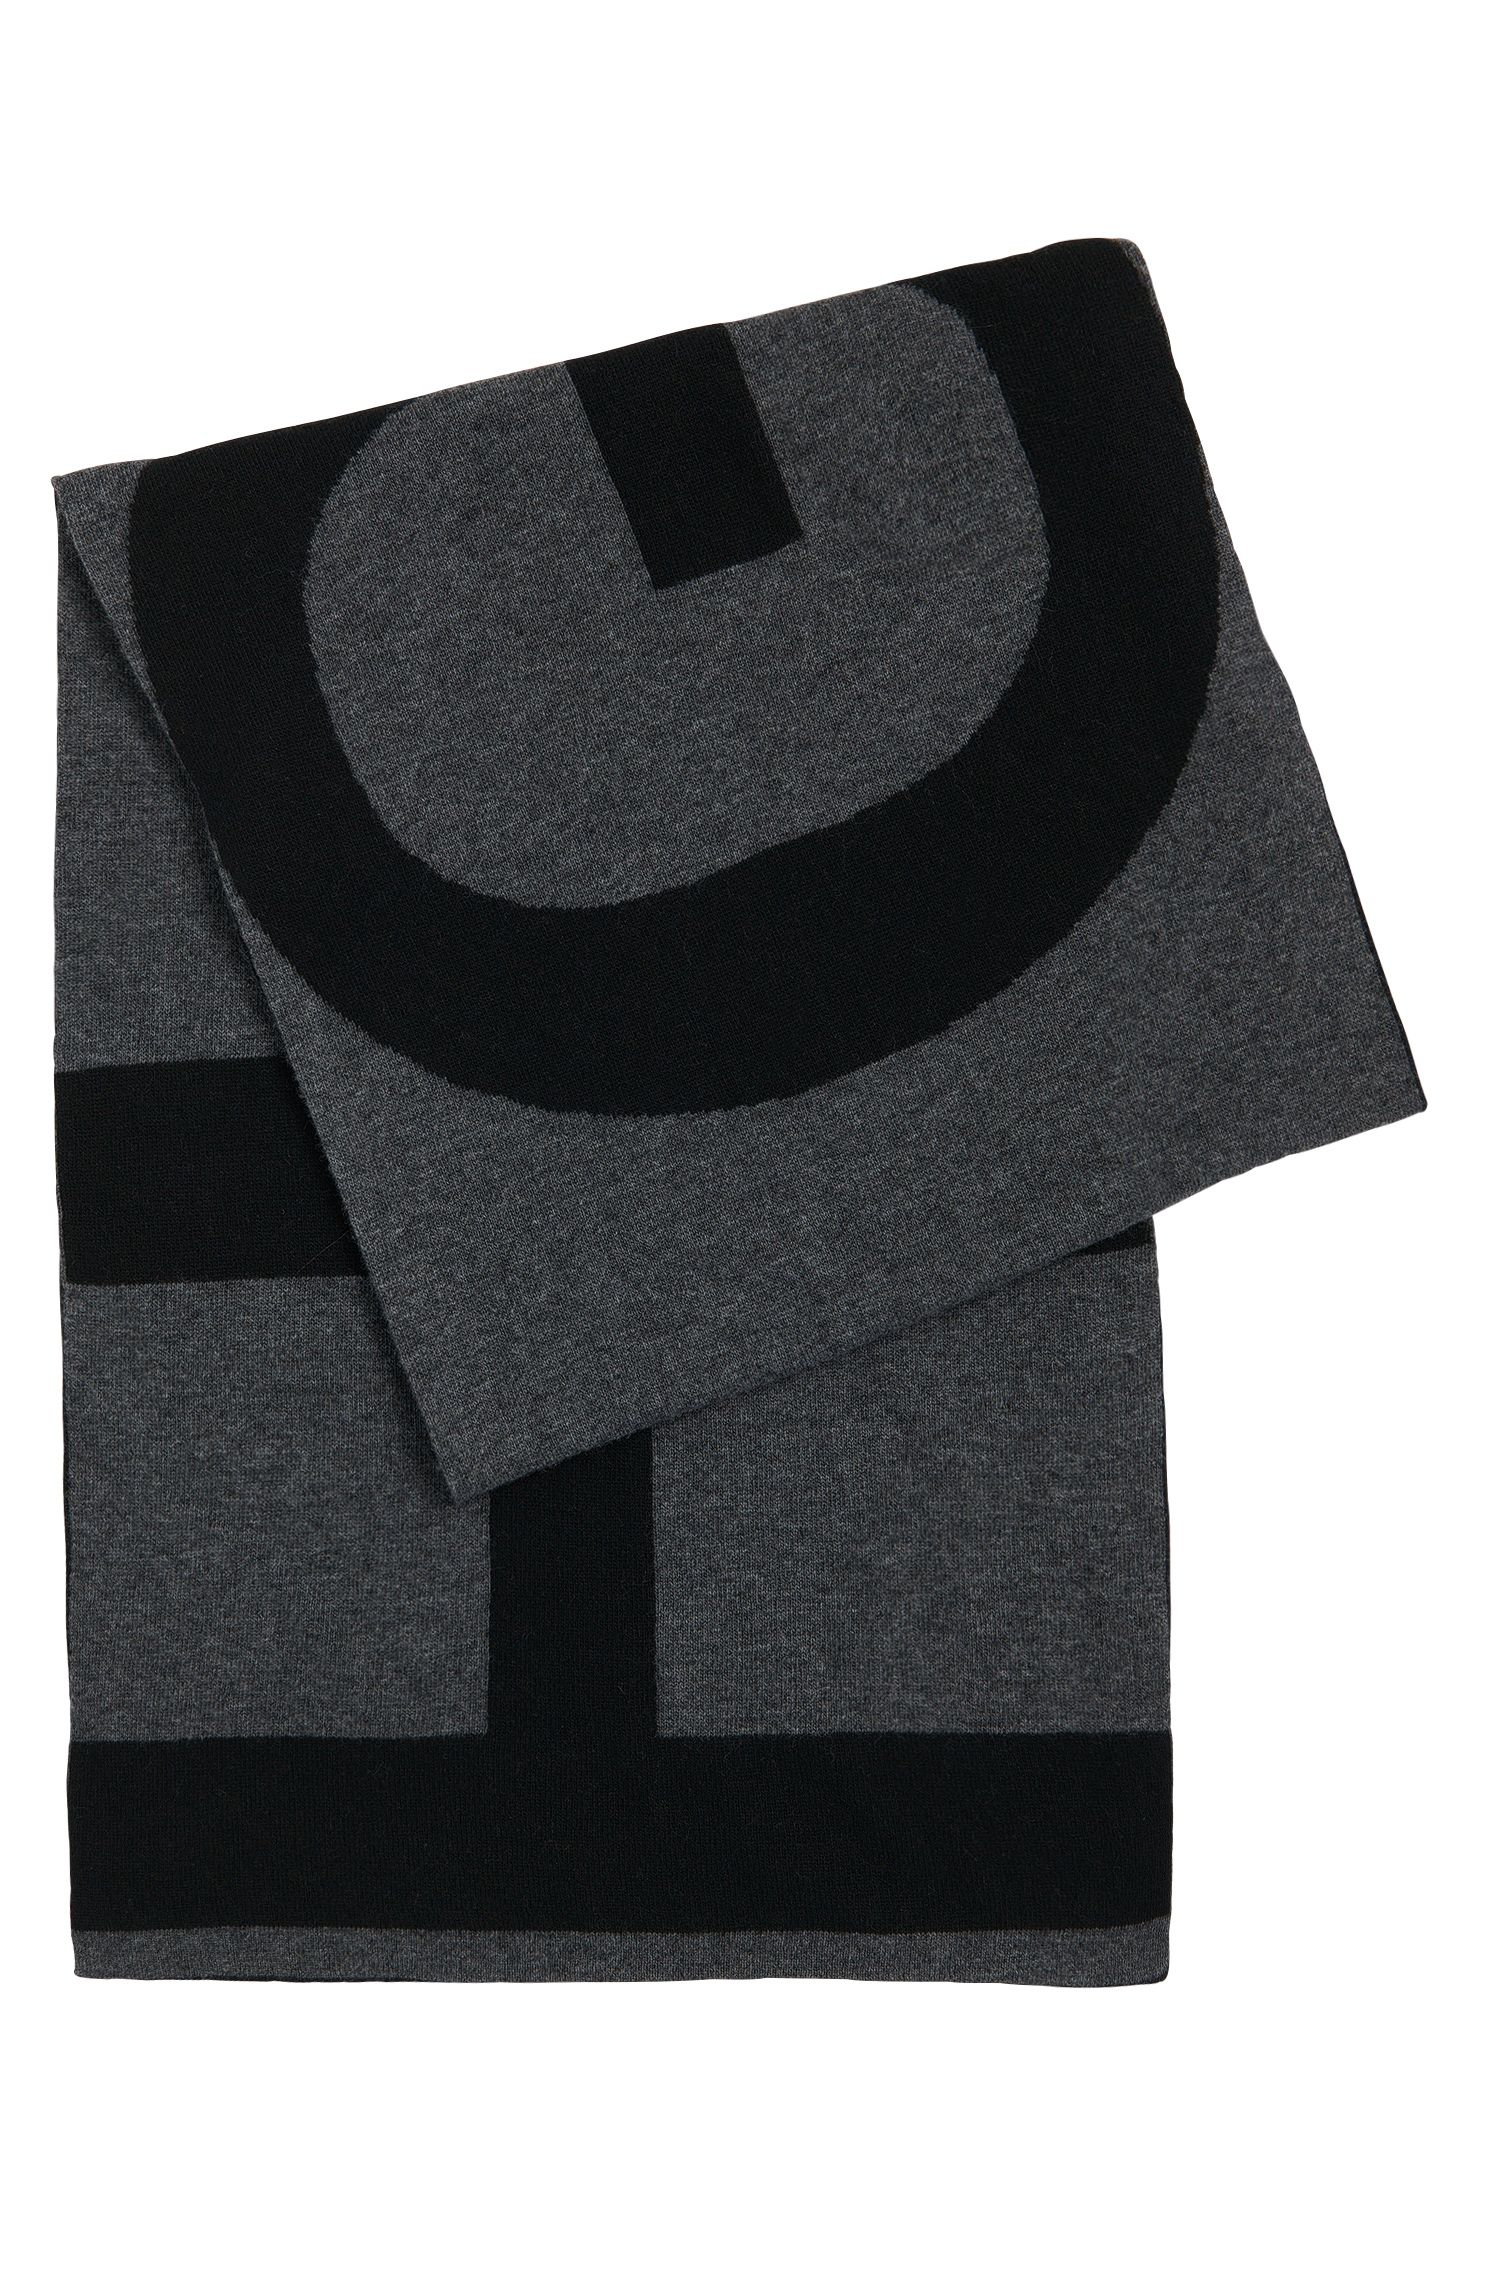 'Men-Z' | Wool Alpaca Cashmere Blend Logo Scarf